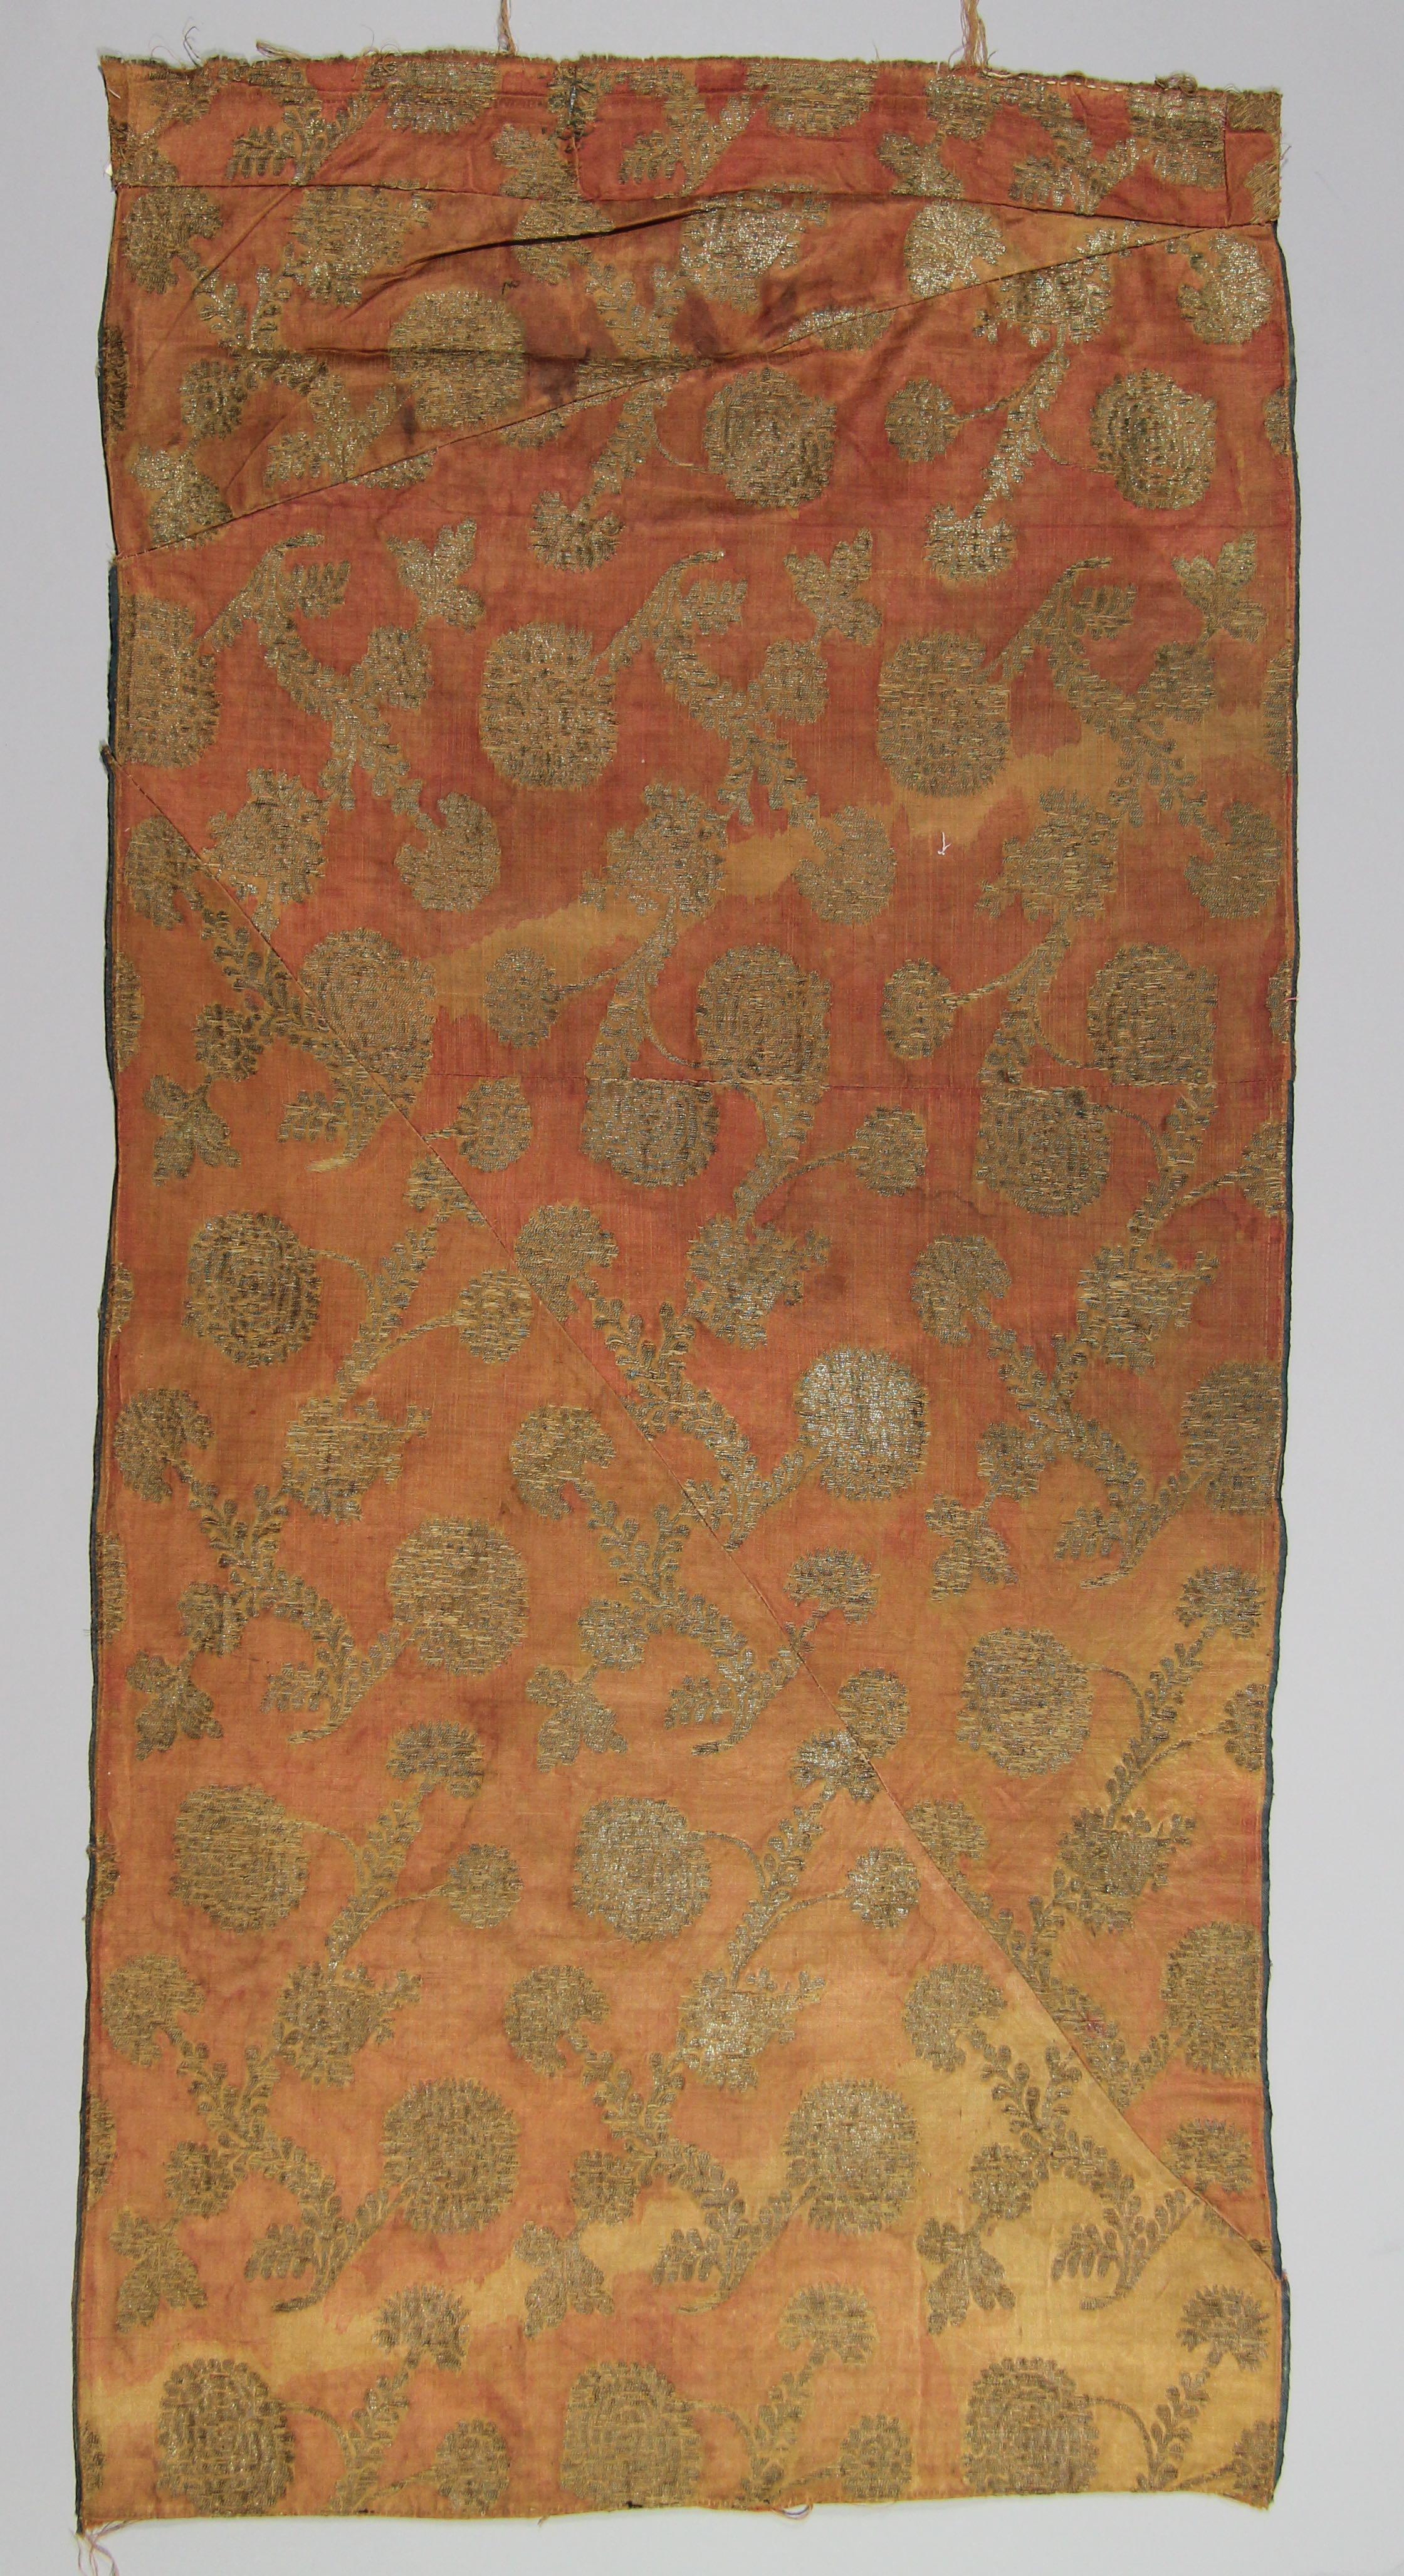 Brocade silk panel